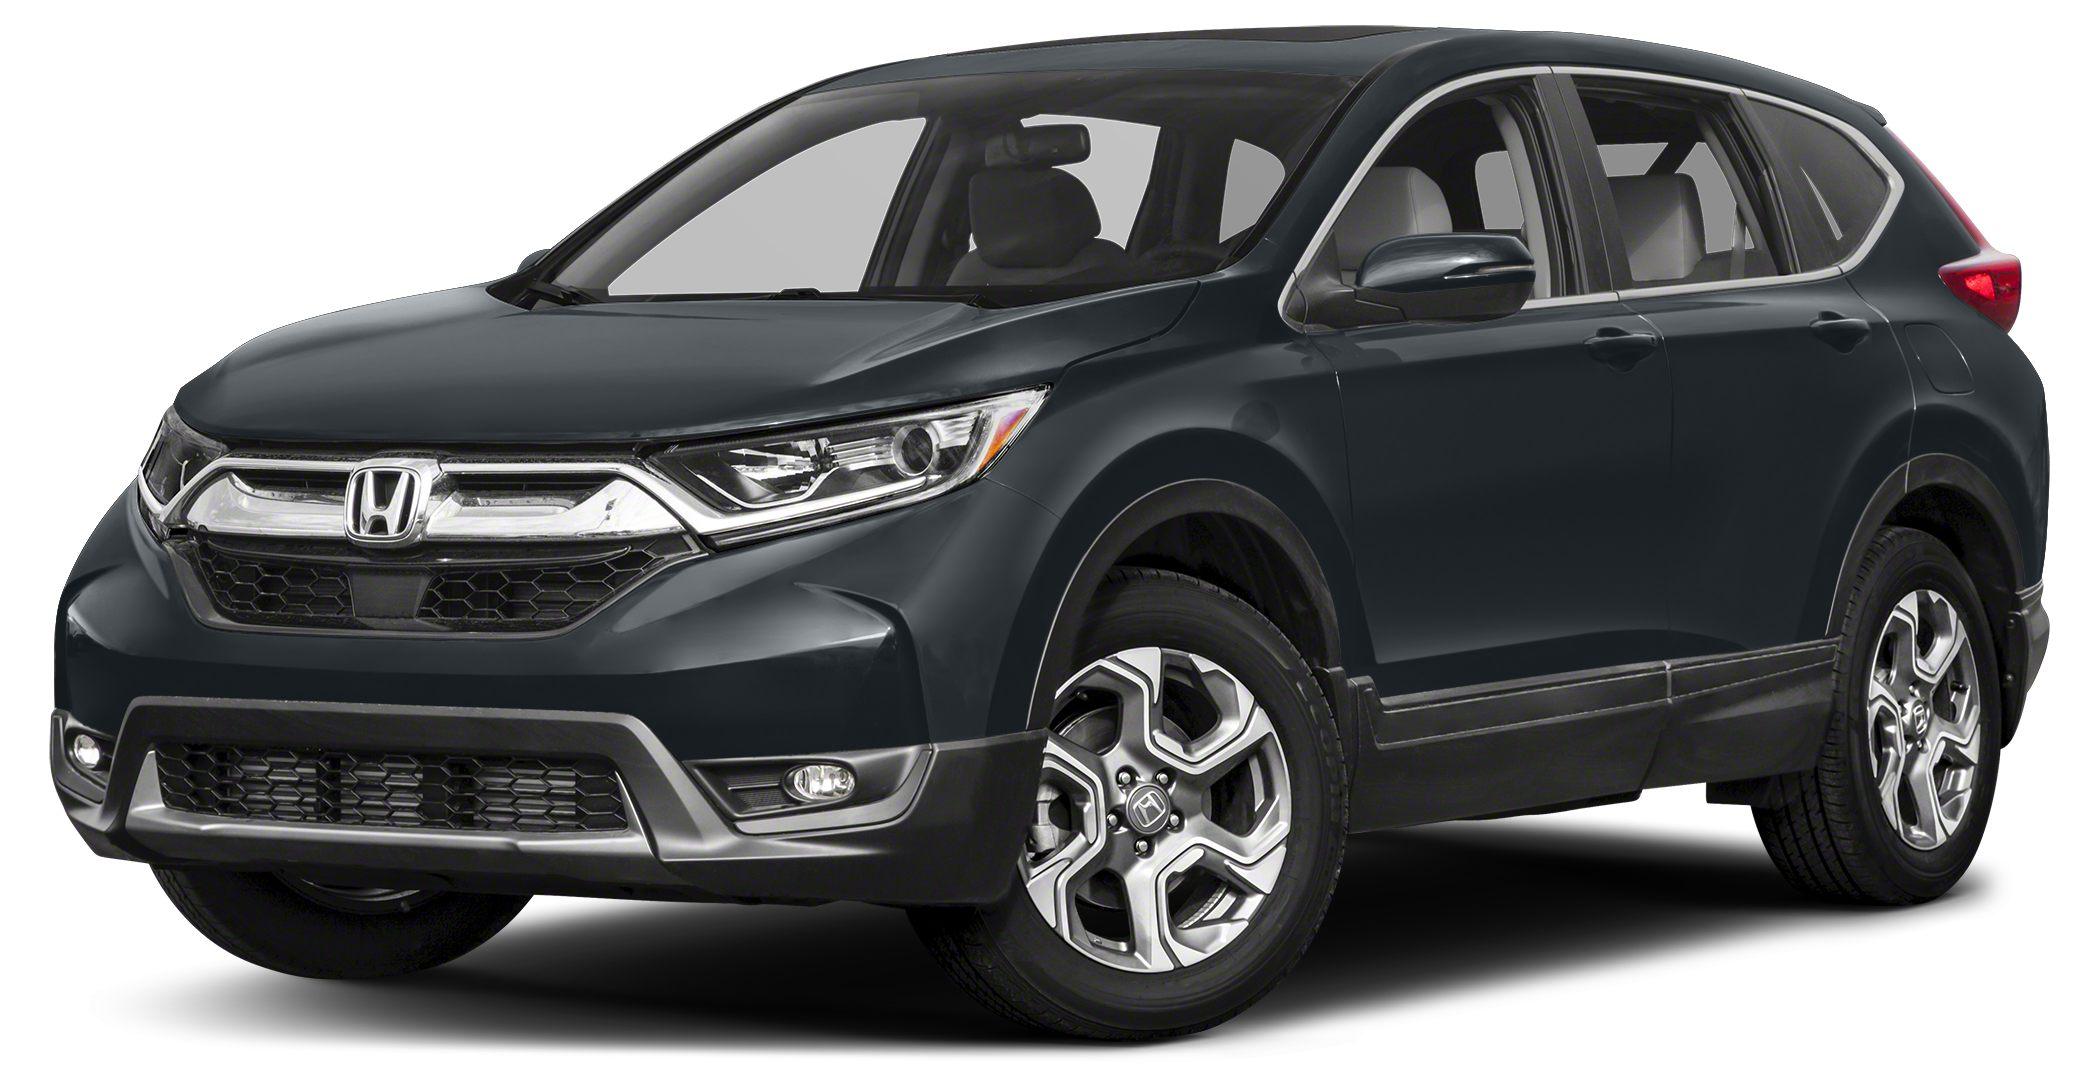 2017 Honda CR-V  Miles 14117Color Gray Stock P2564A VIN 5J6RW2H84HL007758